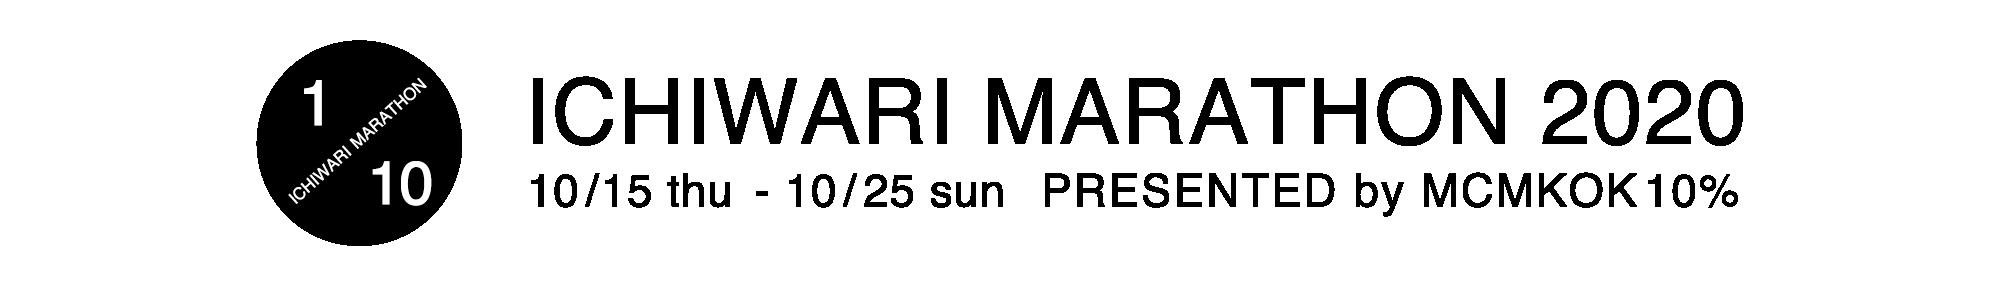 ICHIWARI MARATHON